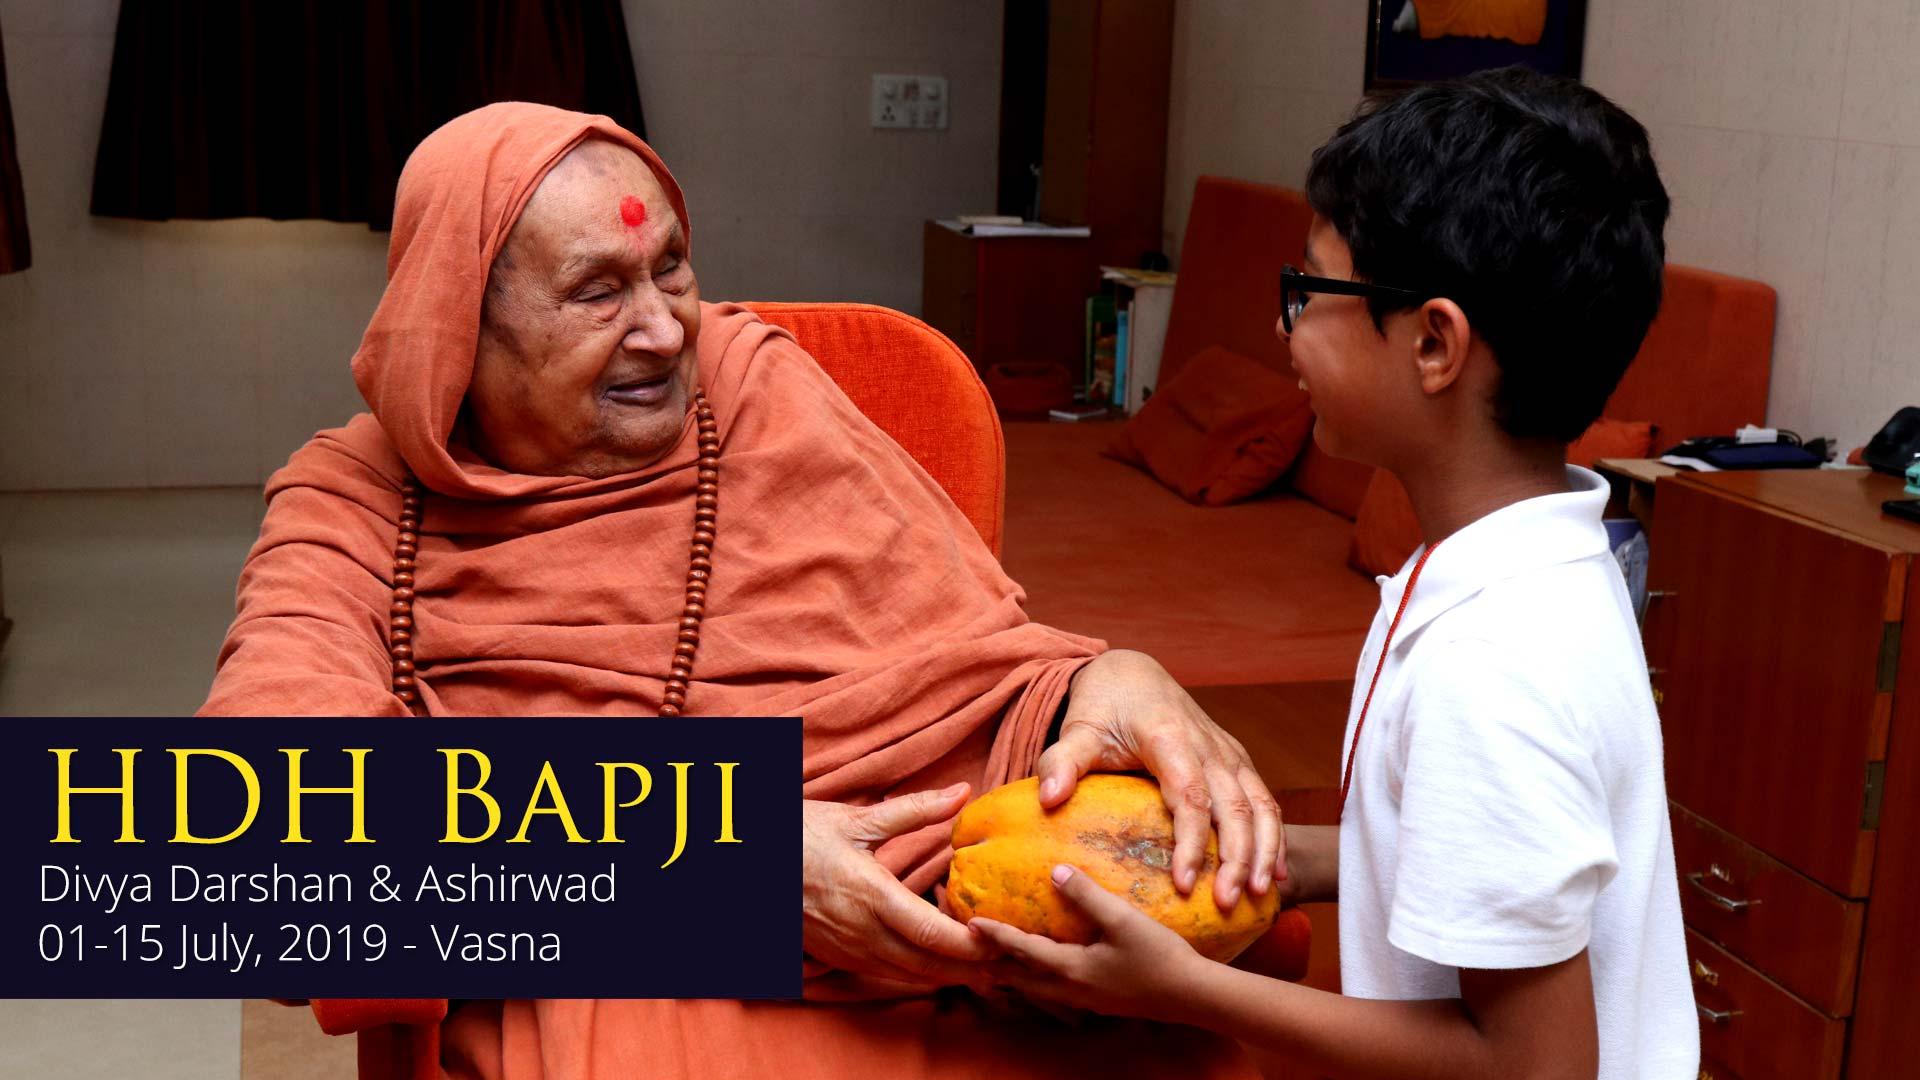 HDH Bapji Divya Darshan-Ashirwad | 01 to 15 July, 2019